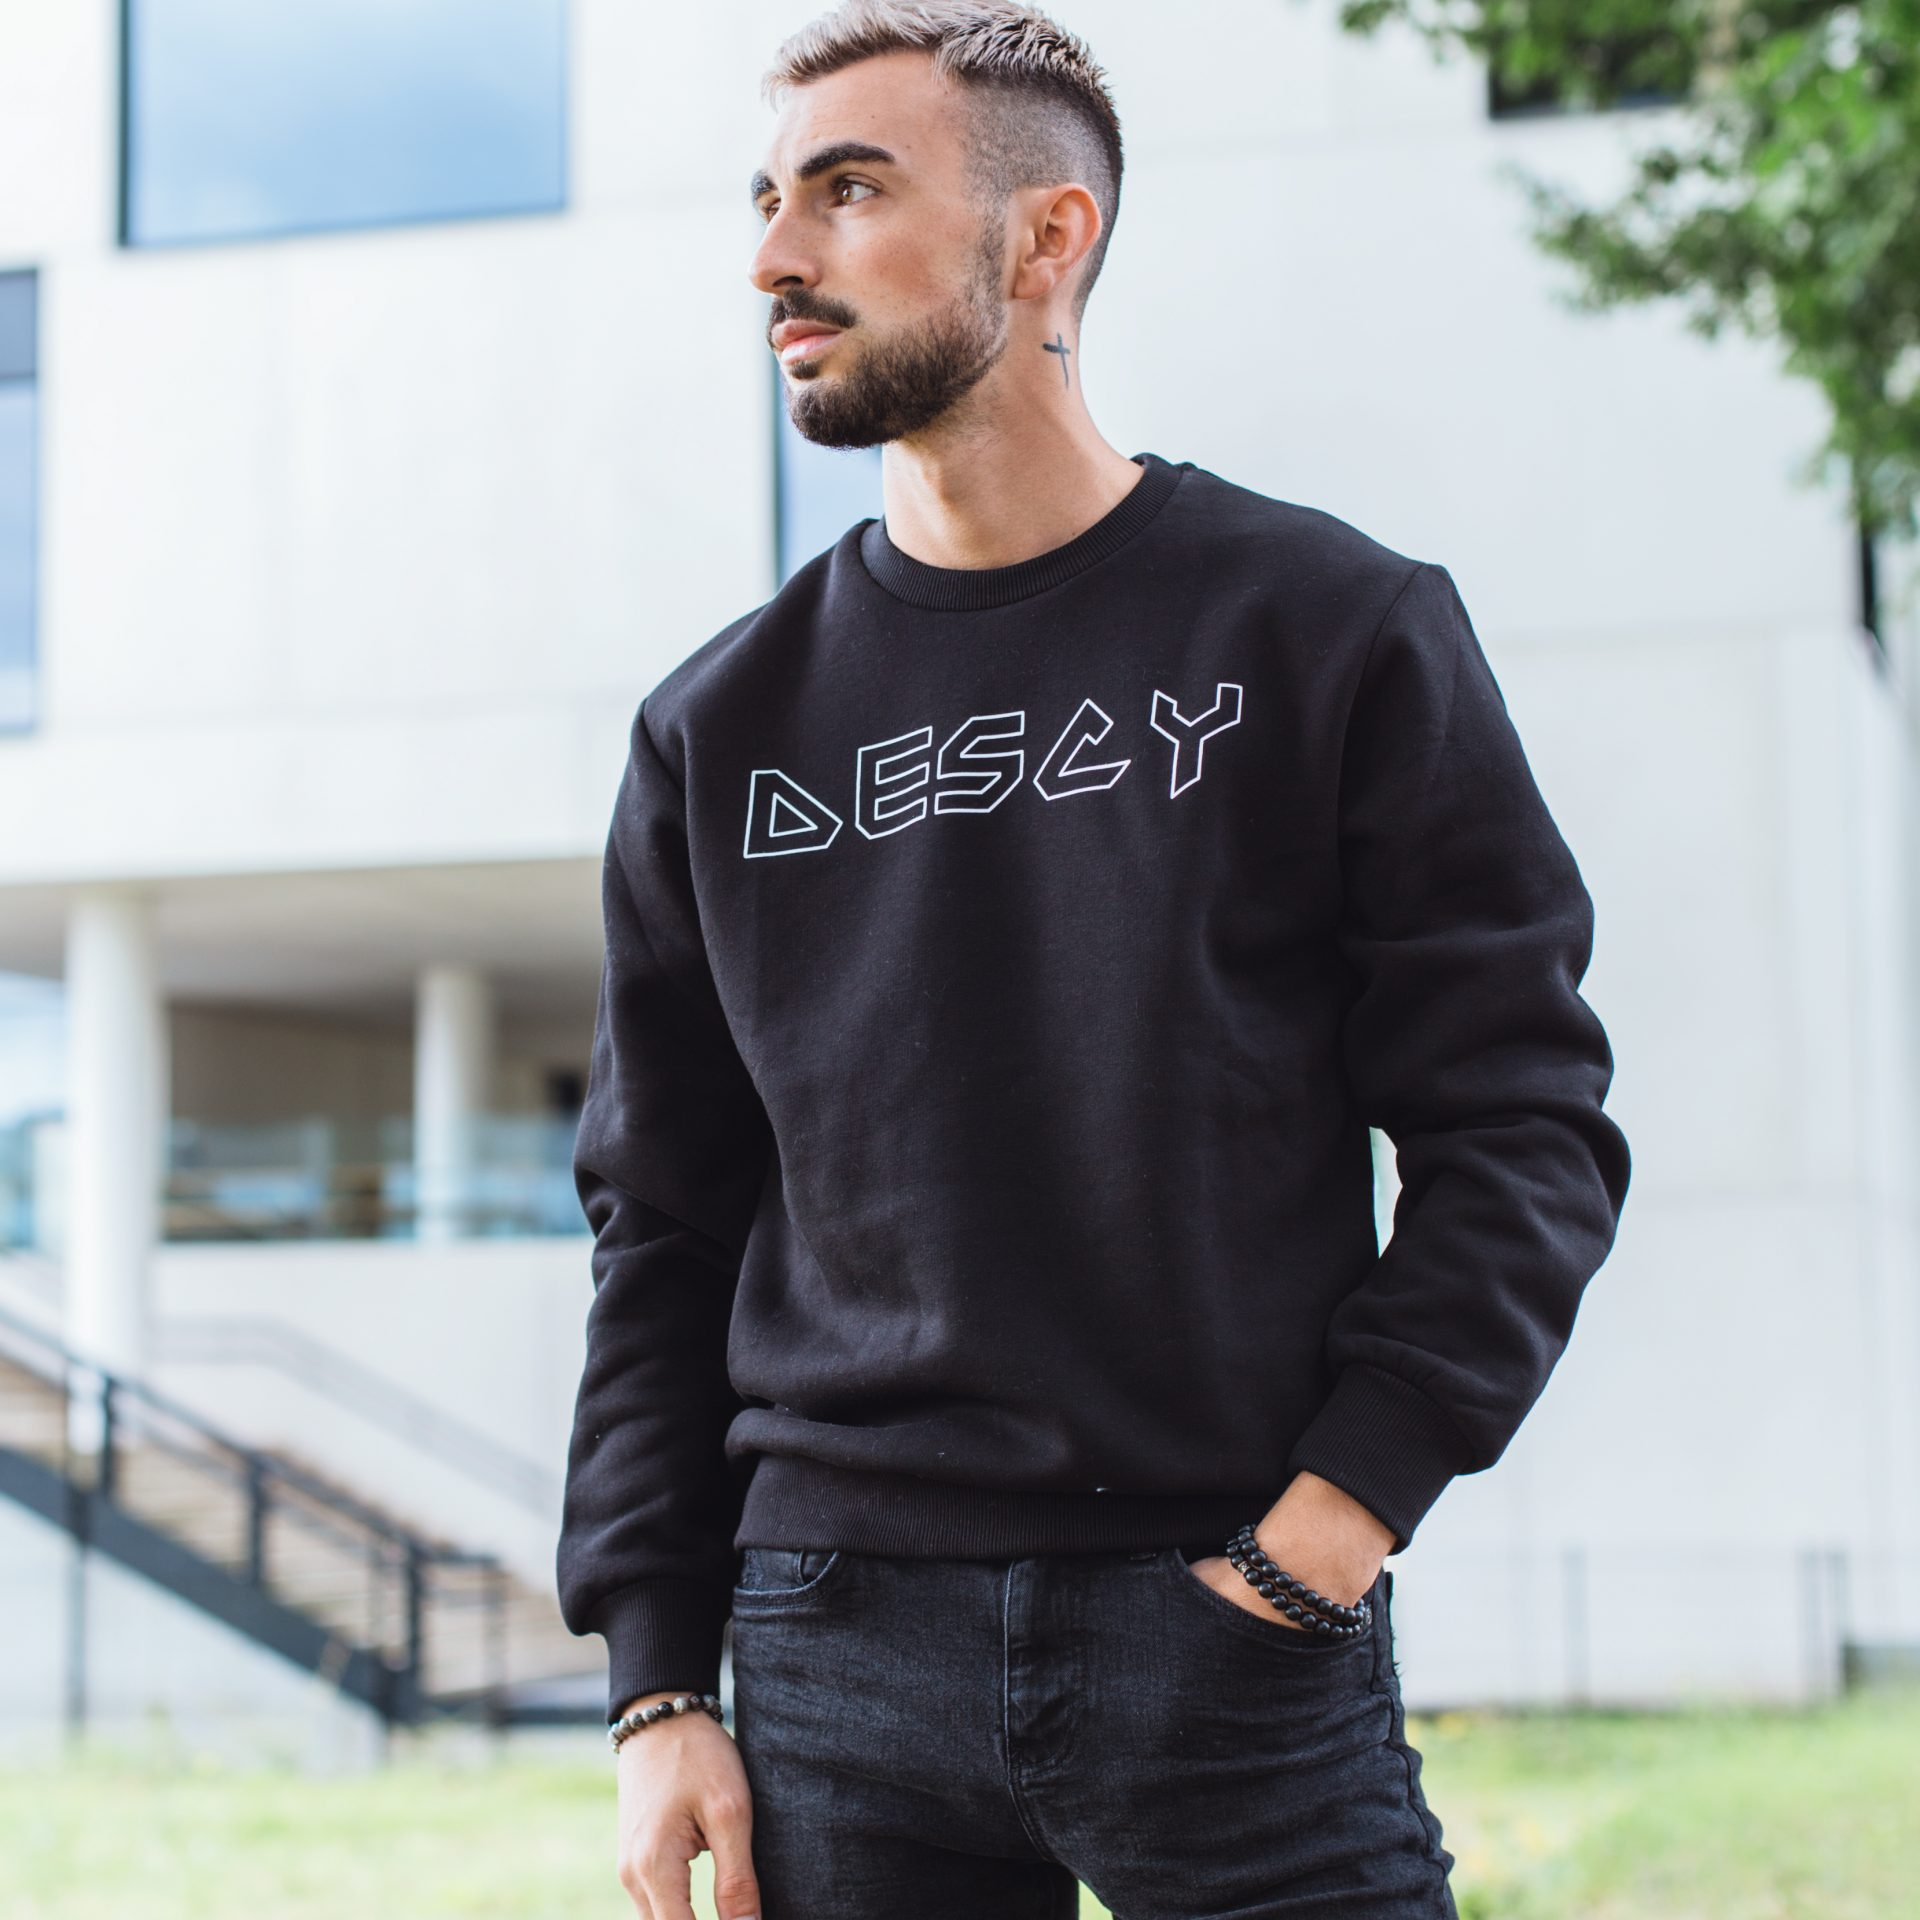 DESCY Iron Logo Sweater Black Unisex